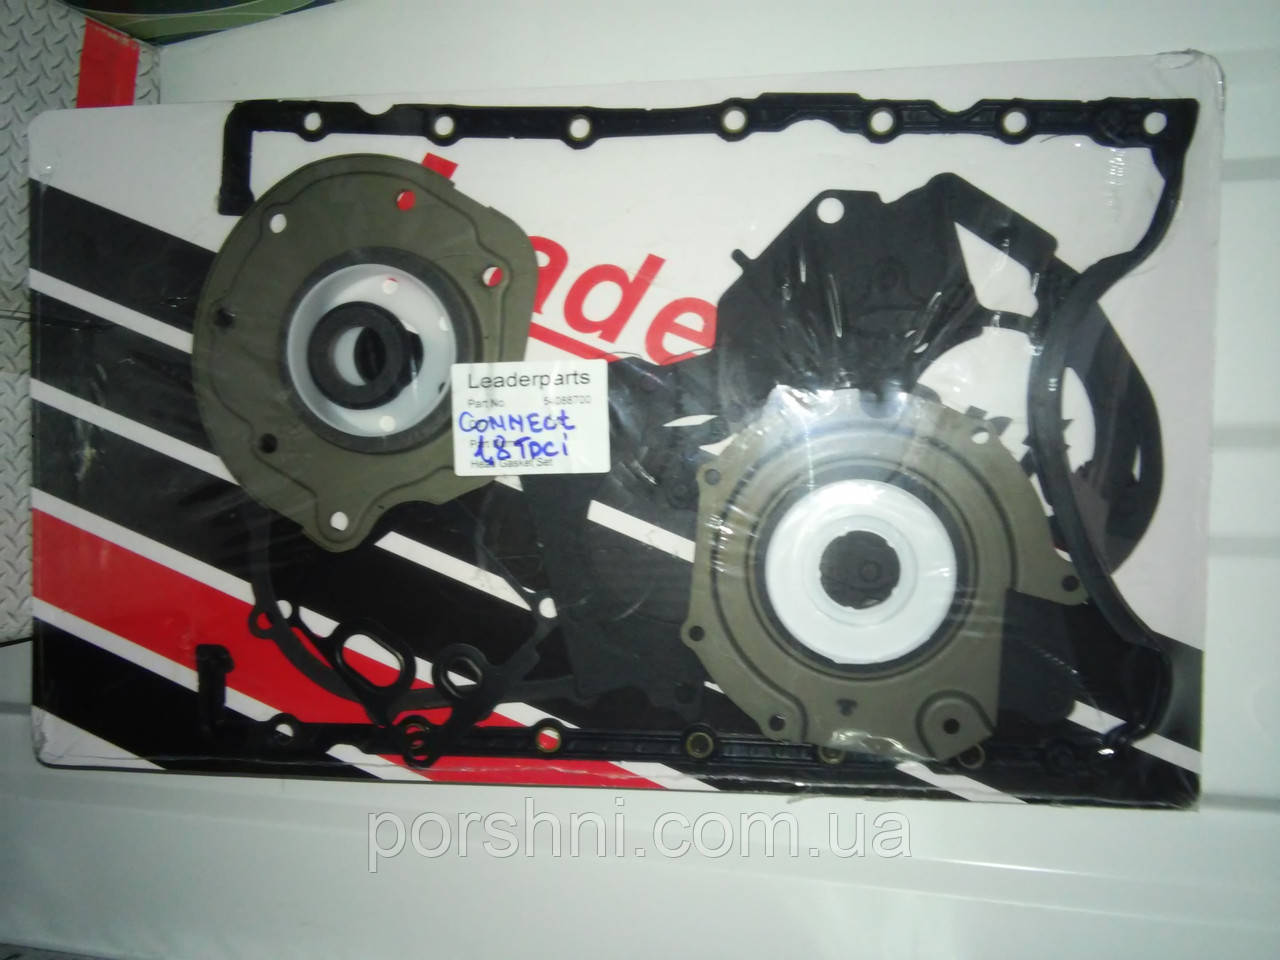 Прокладки двигателя Ford  Connect  1.8 TDCI  Leaderpar 54088700